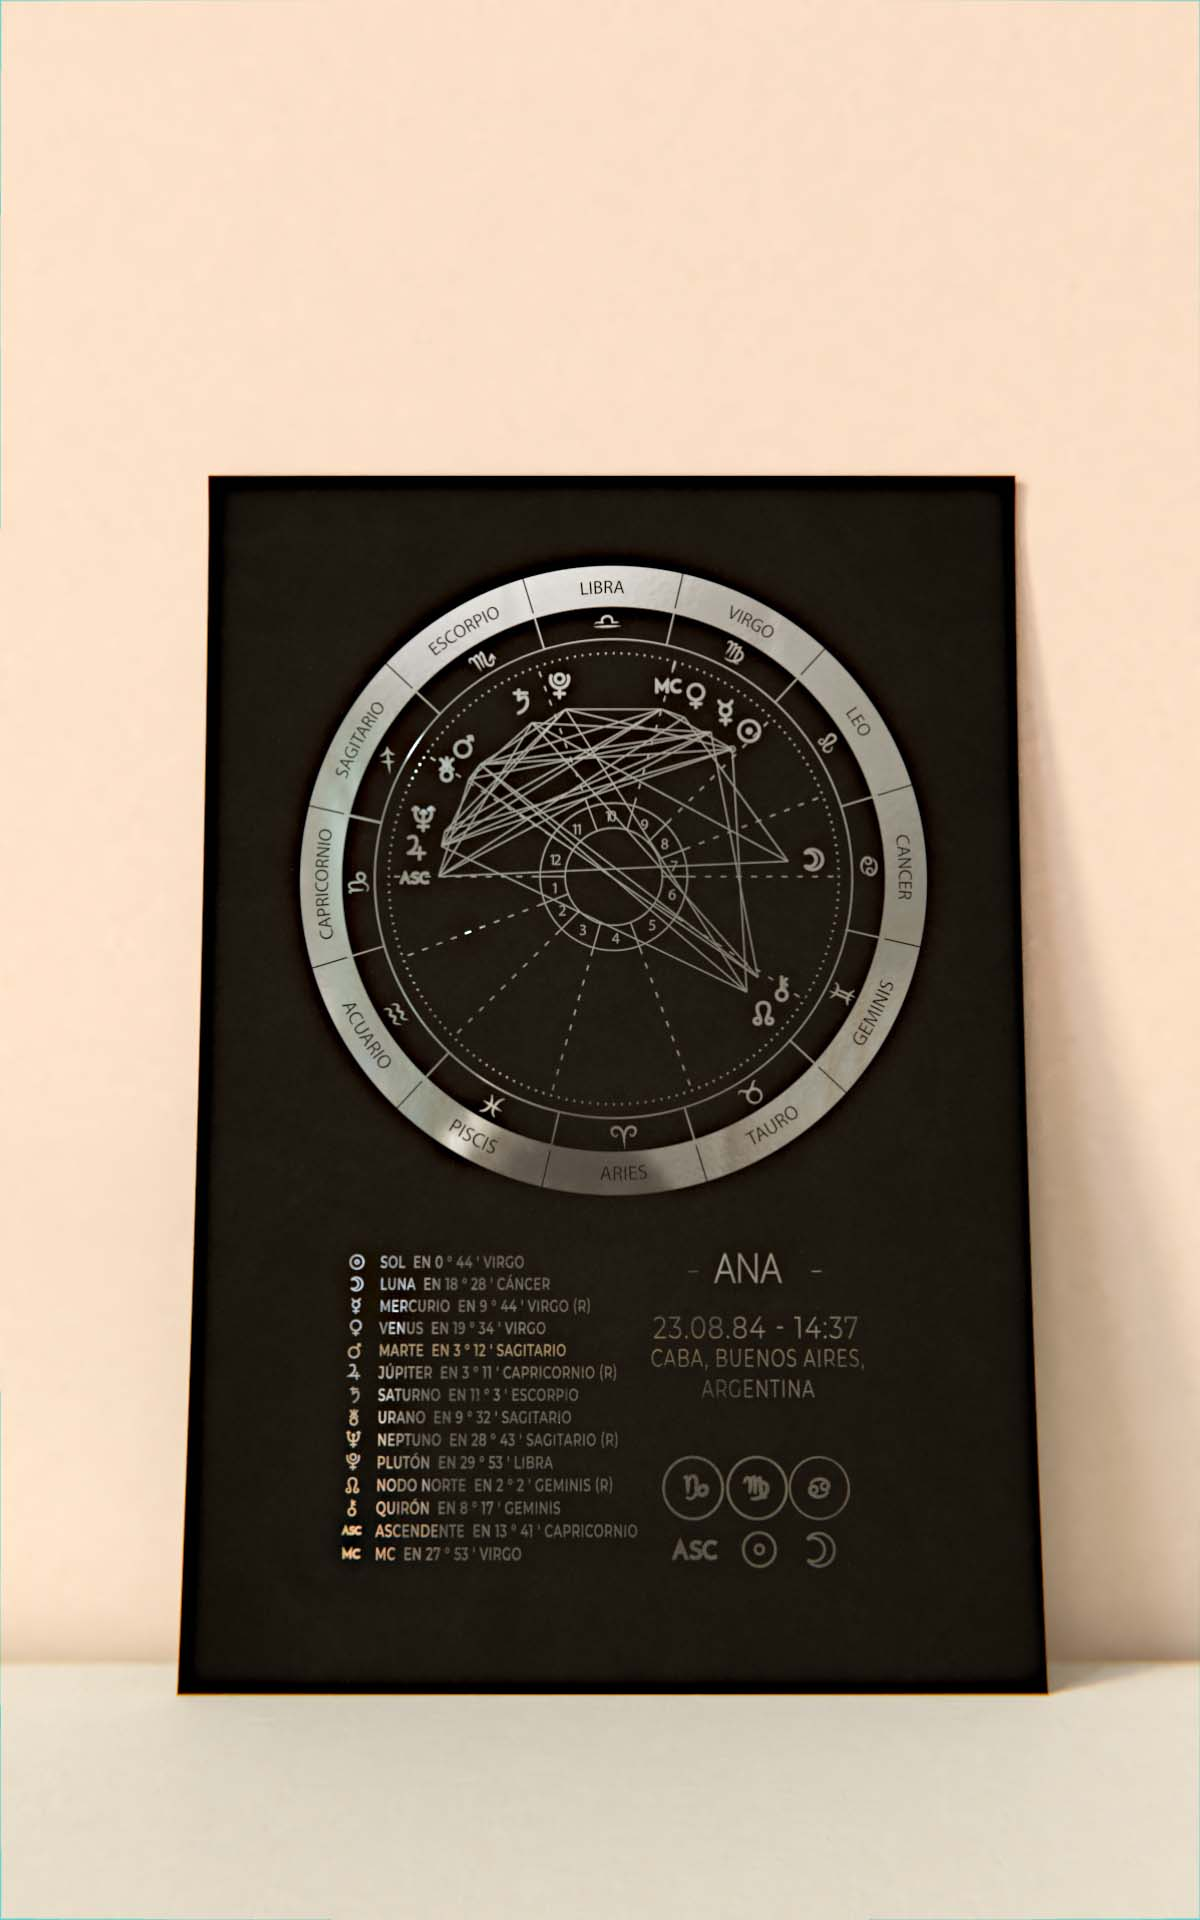 Arte Astral - Carta Astral Detallada Plateado Sin Marco Hoja Negra